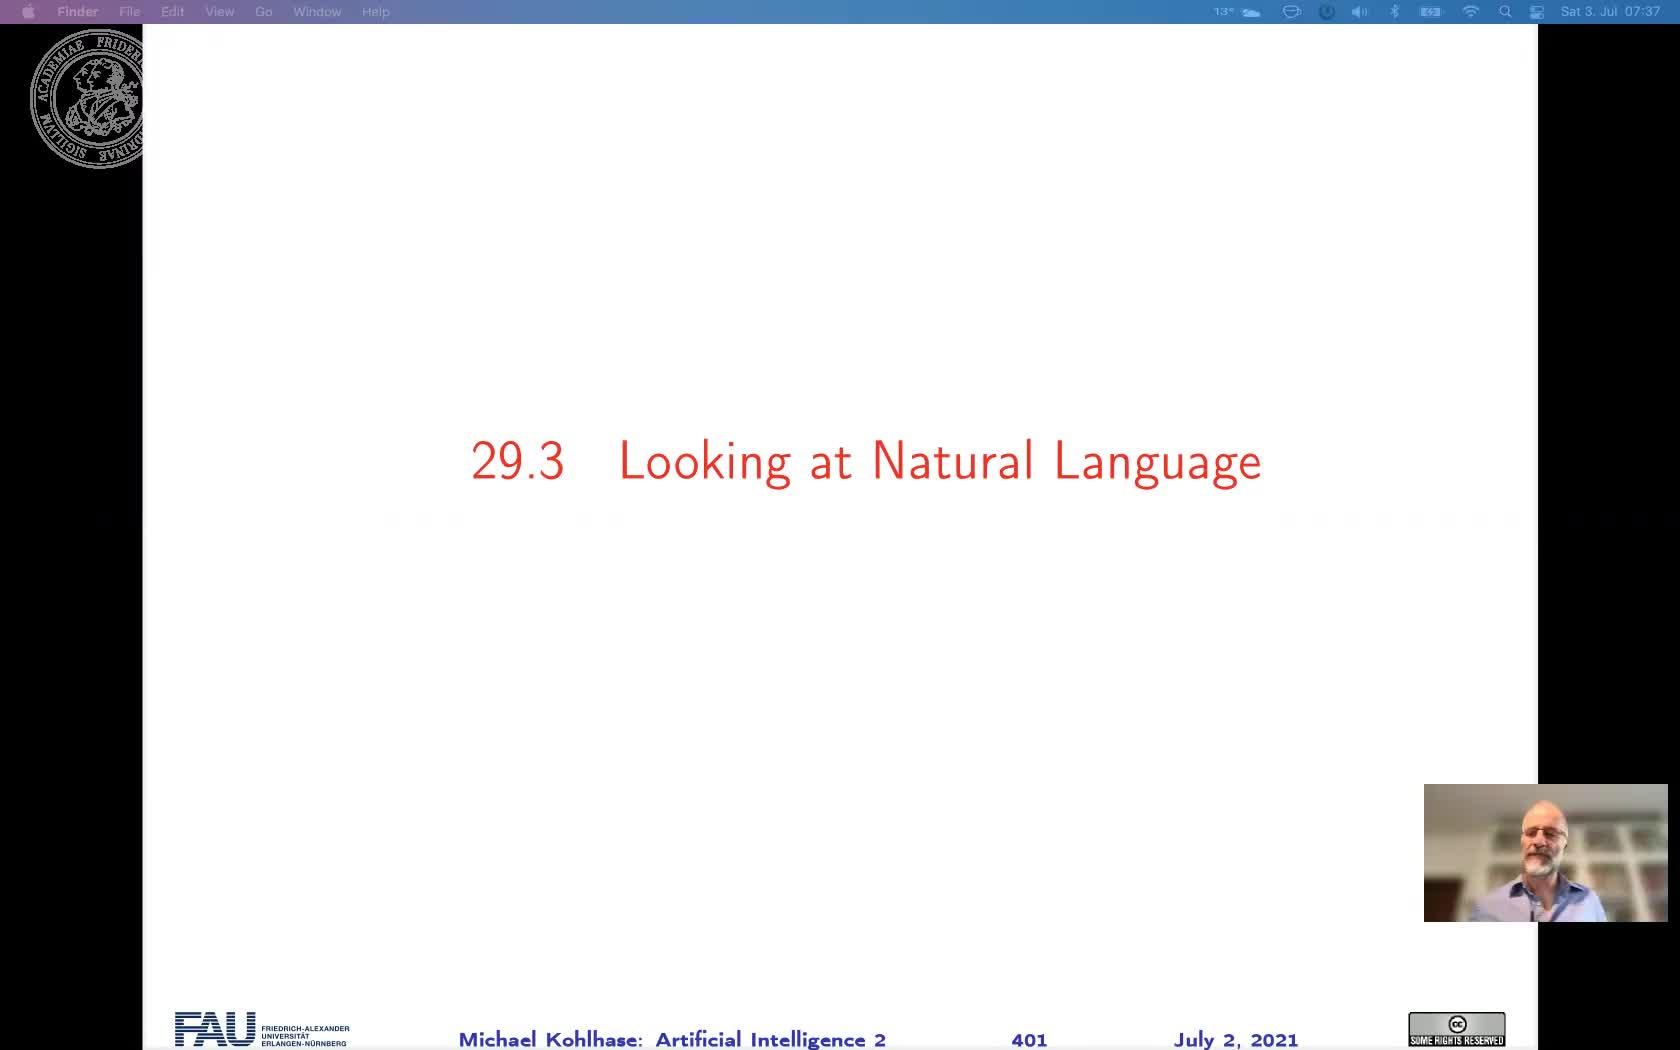 29.3 Looking at Natural Language preview image